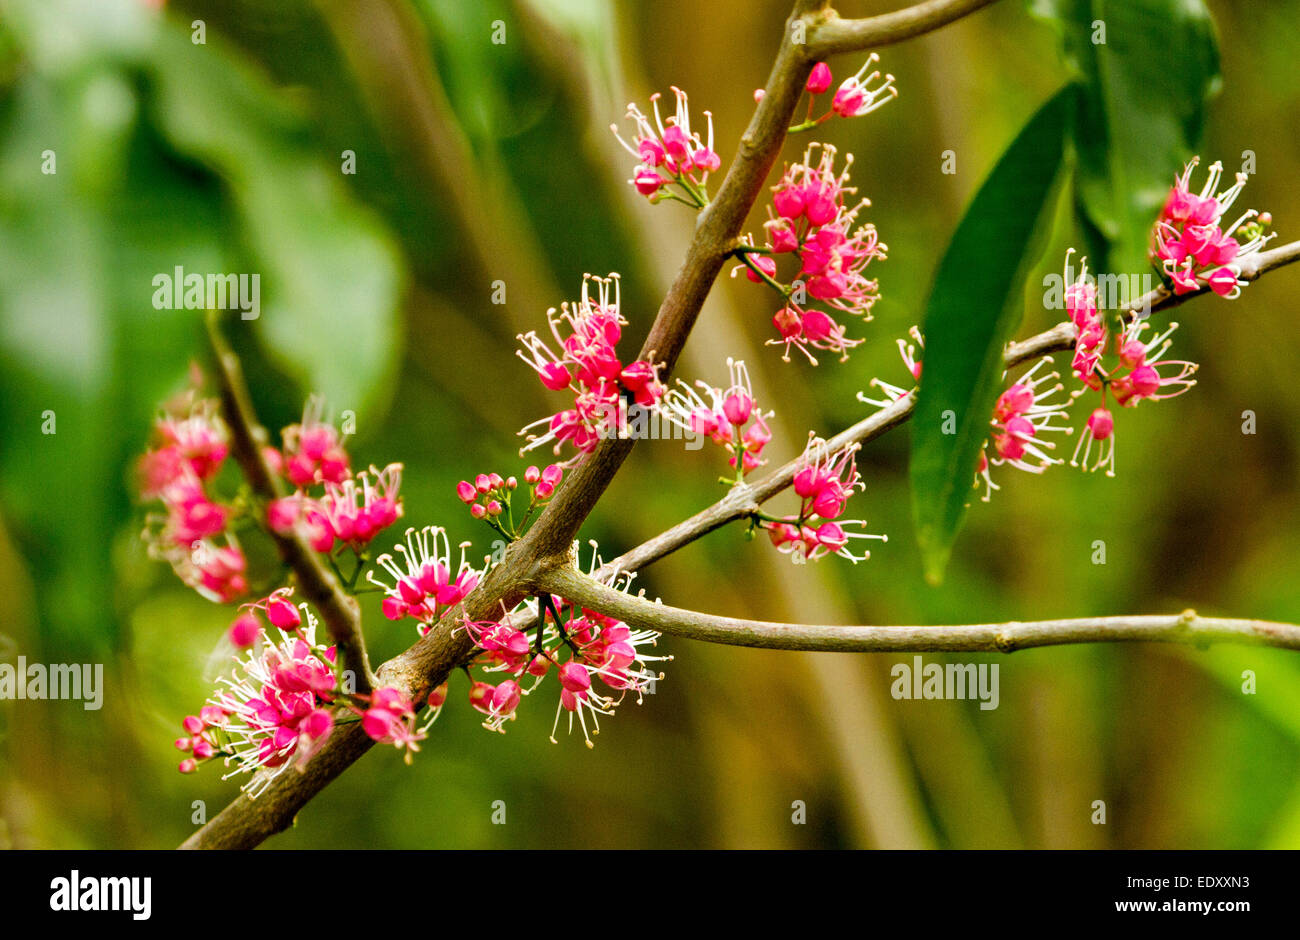 Clusters of vivid pink flowers of australian native corkwood tree clusters of vivid pink flowers of australian native corkwood tree melicope syn euodia elleryana against green background mightylinksfo